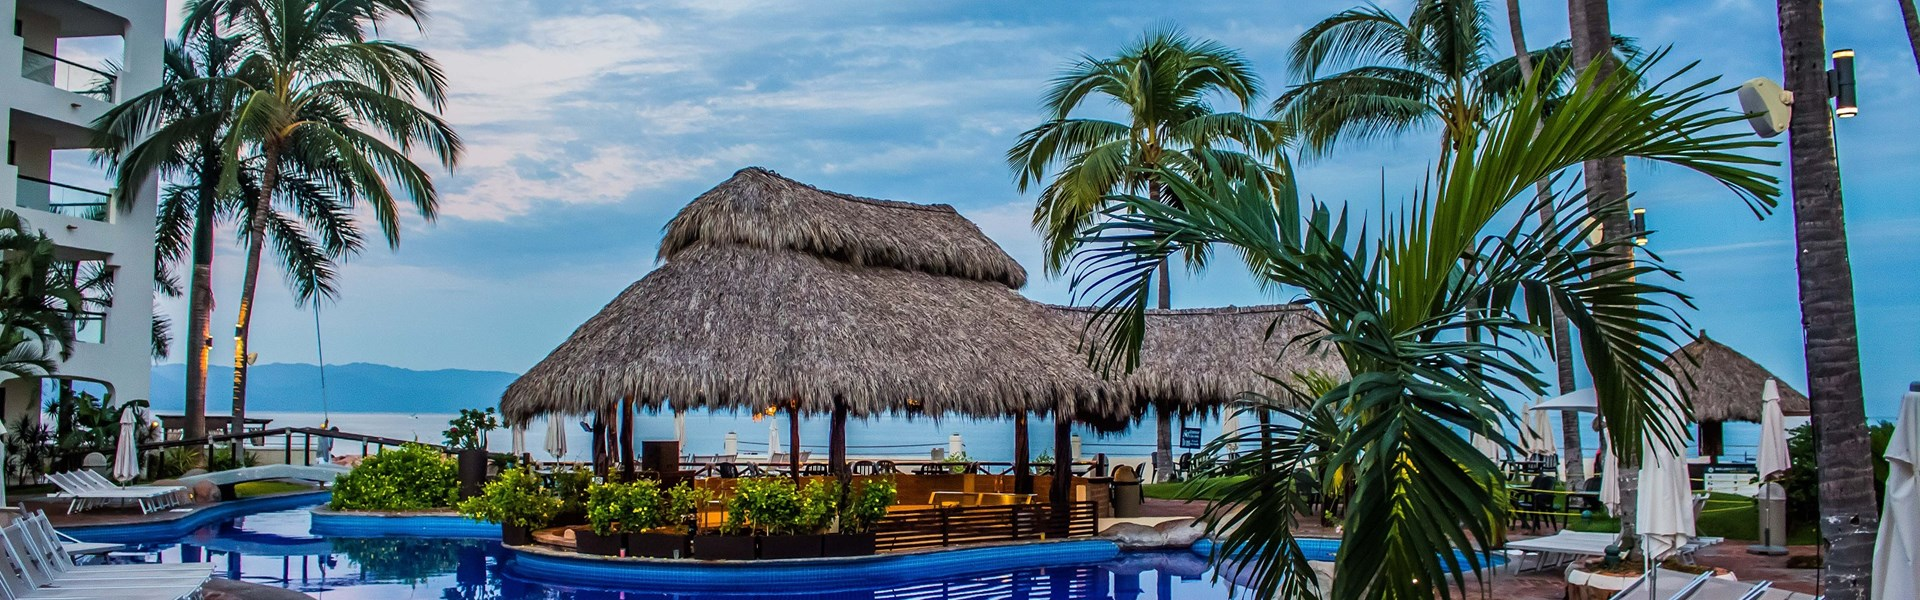 Plaza Pelicanos Grand Beach Resort Wedding Venue